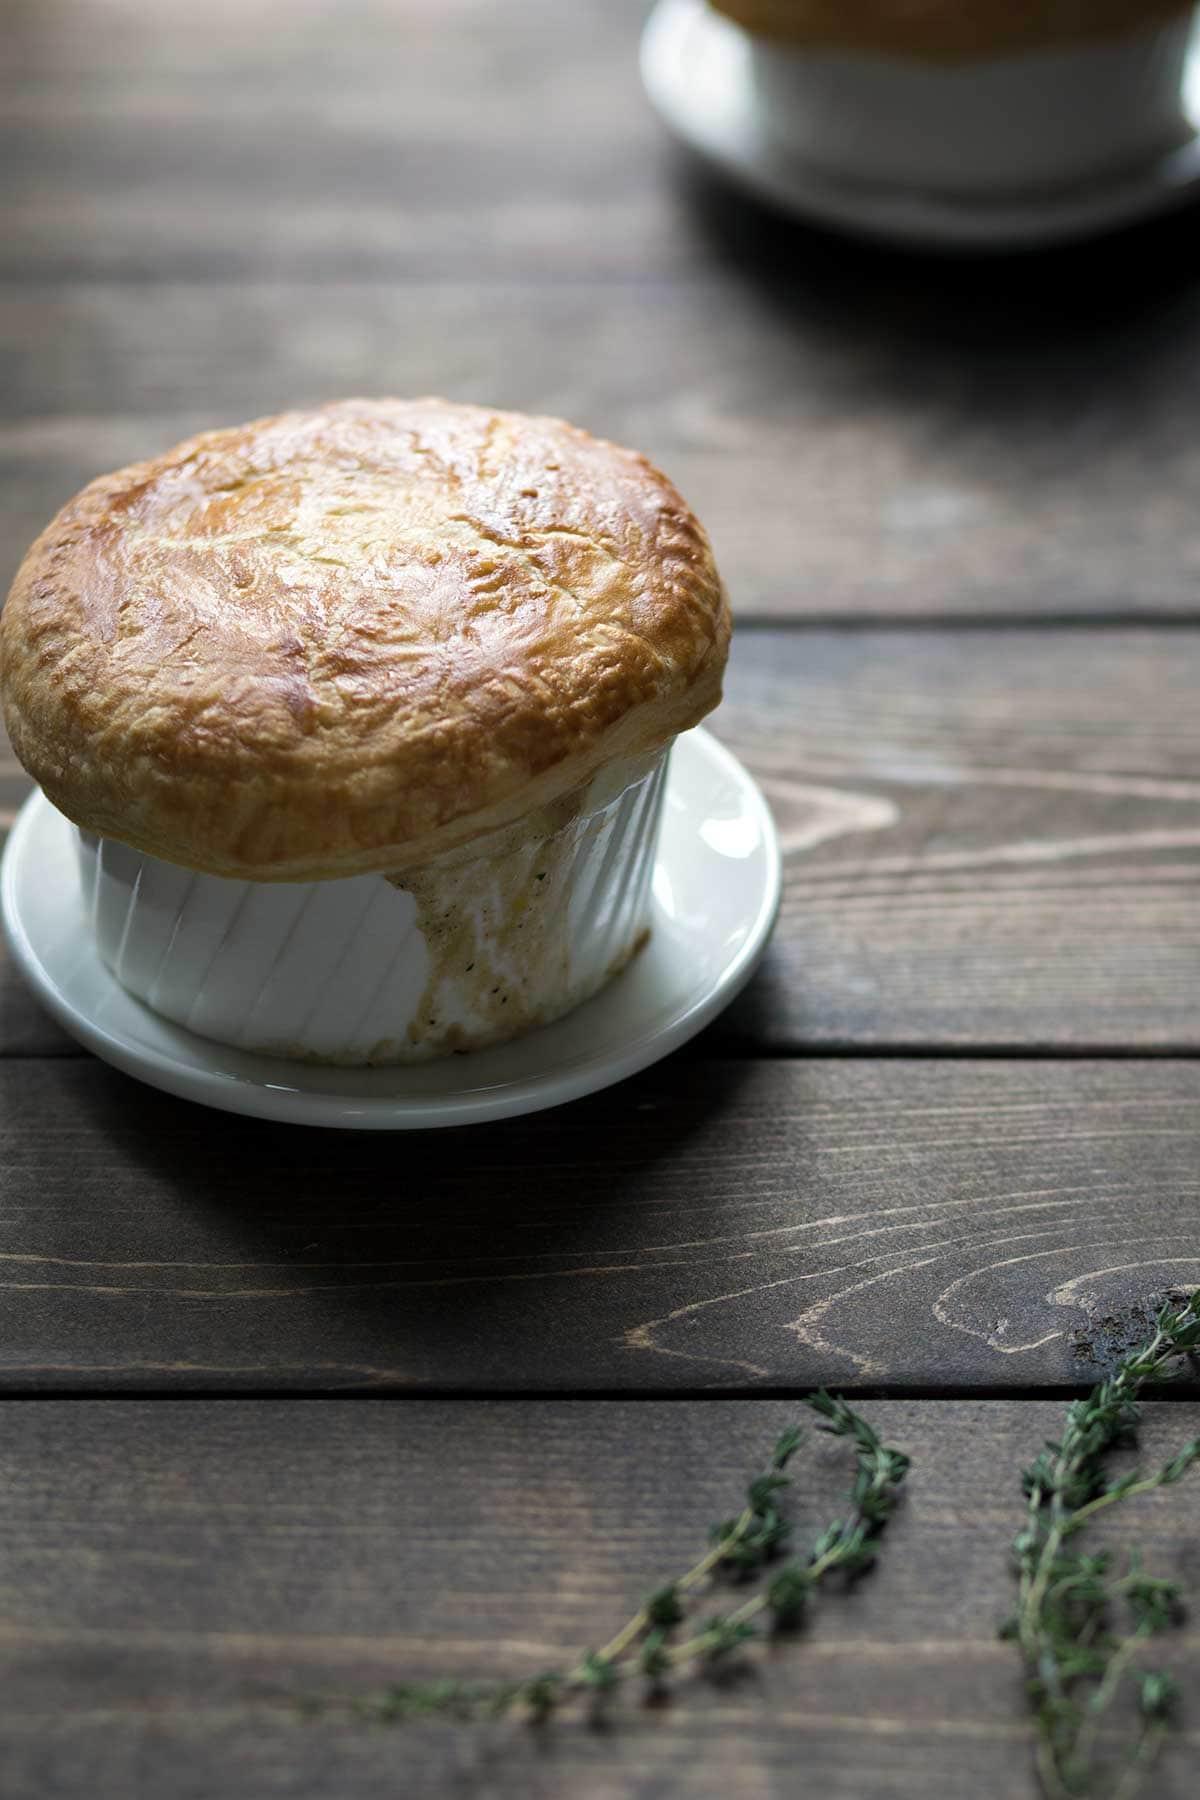 Vegetarian Pot Pie in a ramekin